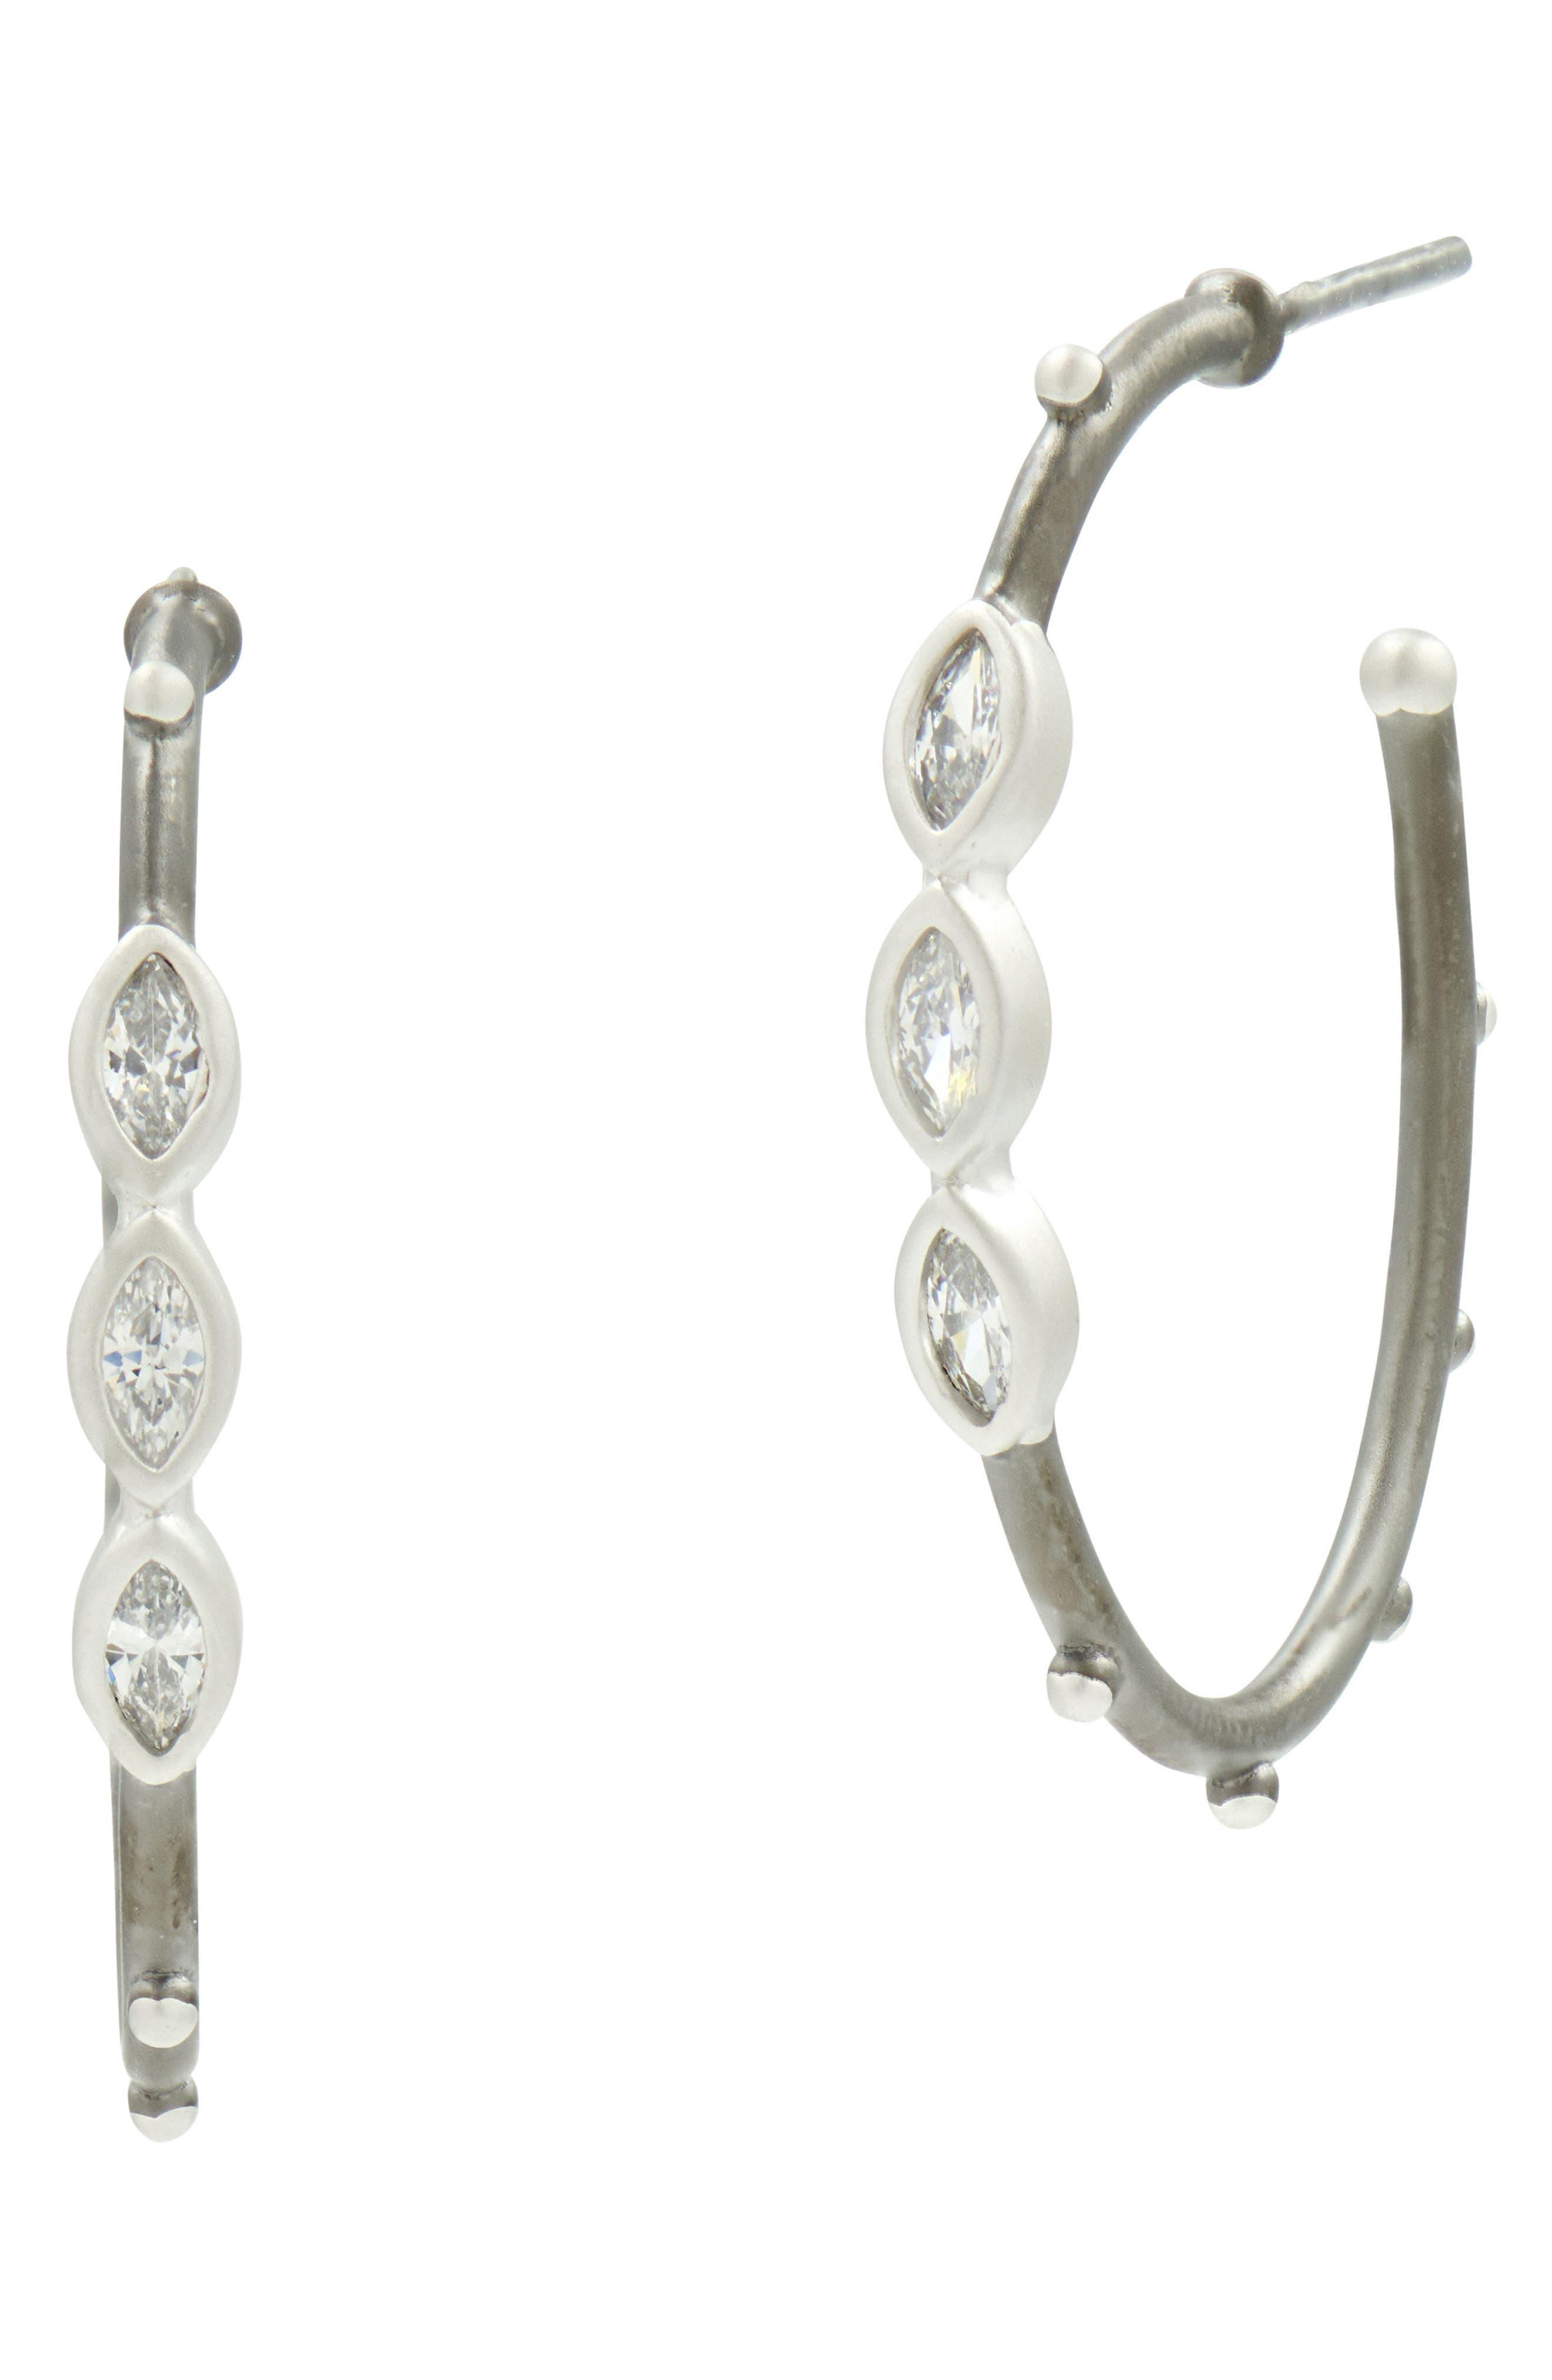 Marquise Hoop Earrings,                             Main thumbnail 1, color,                             Silver/ Black Rhodium